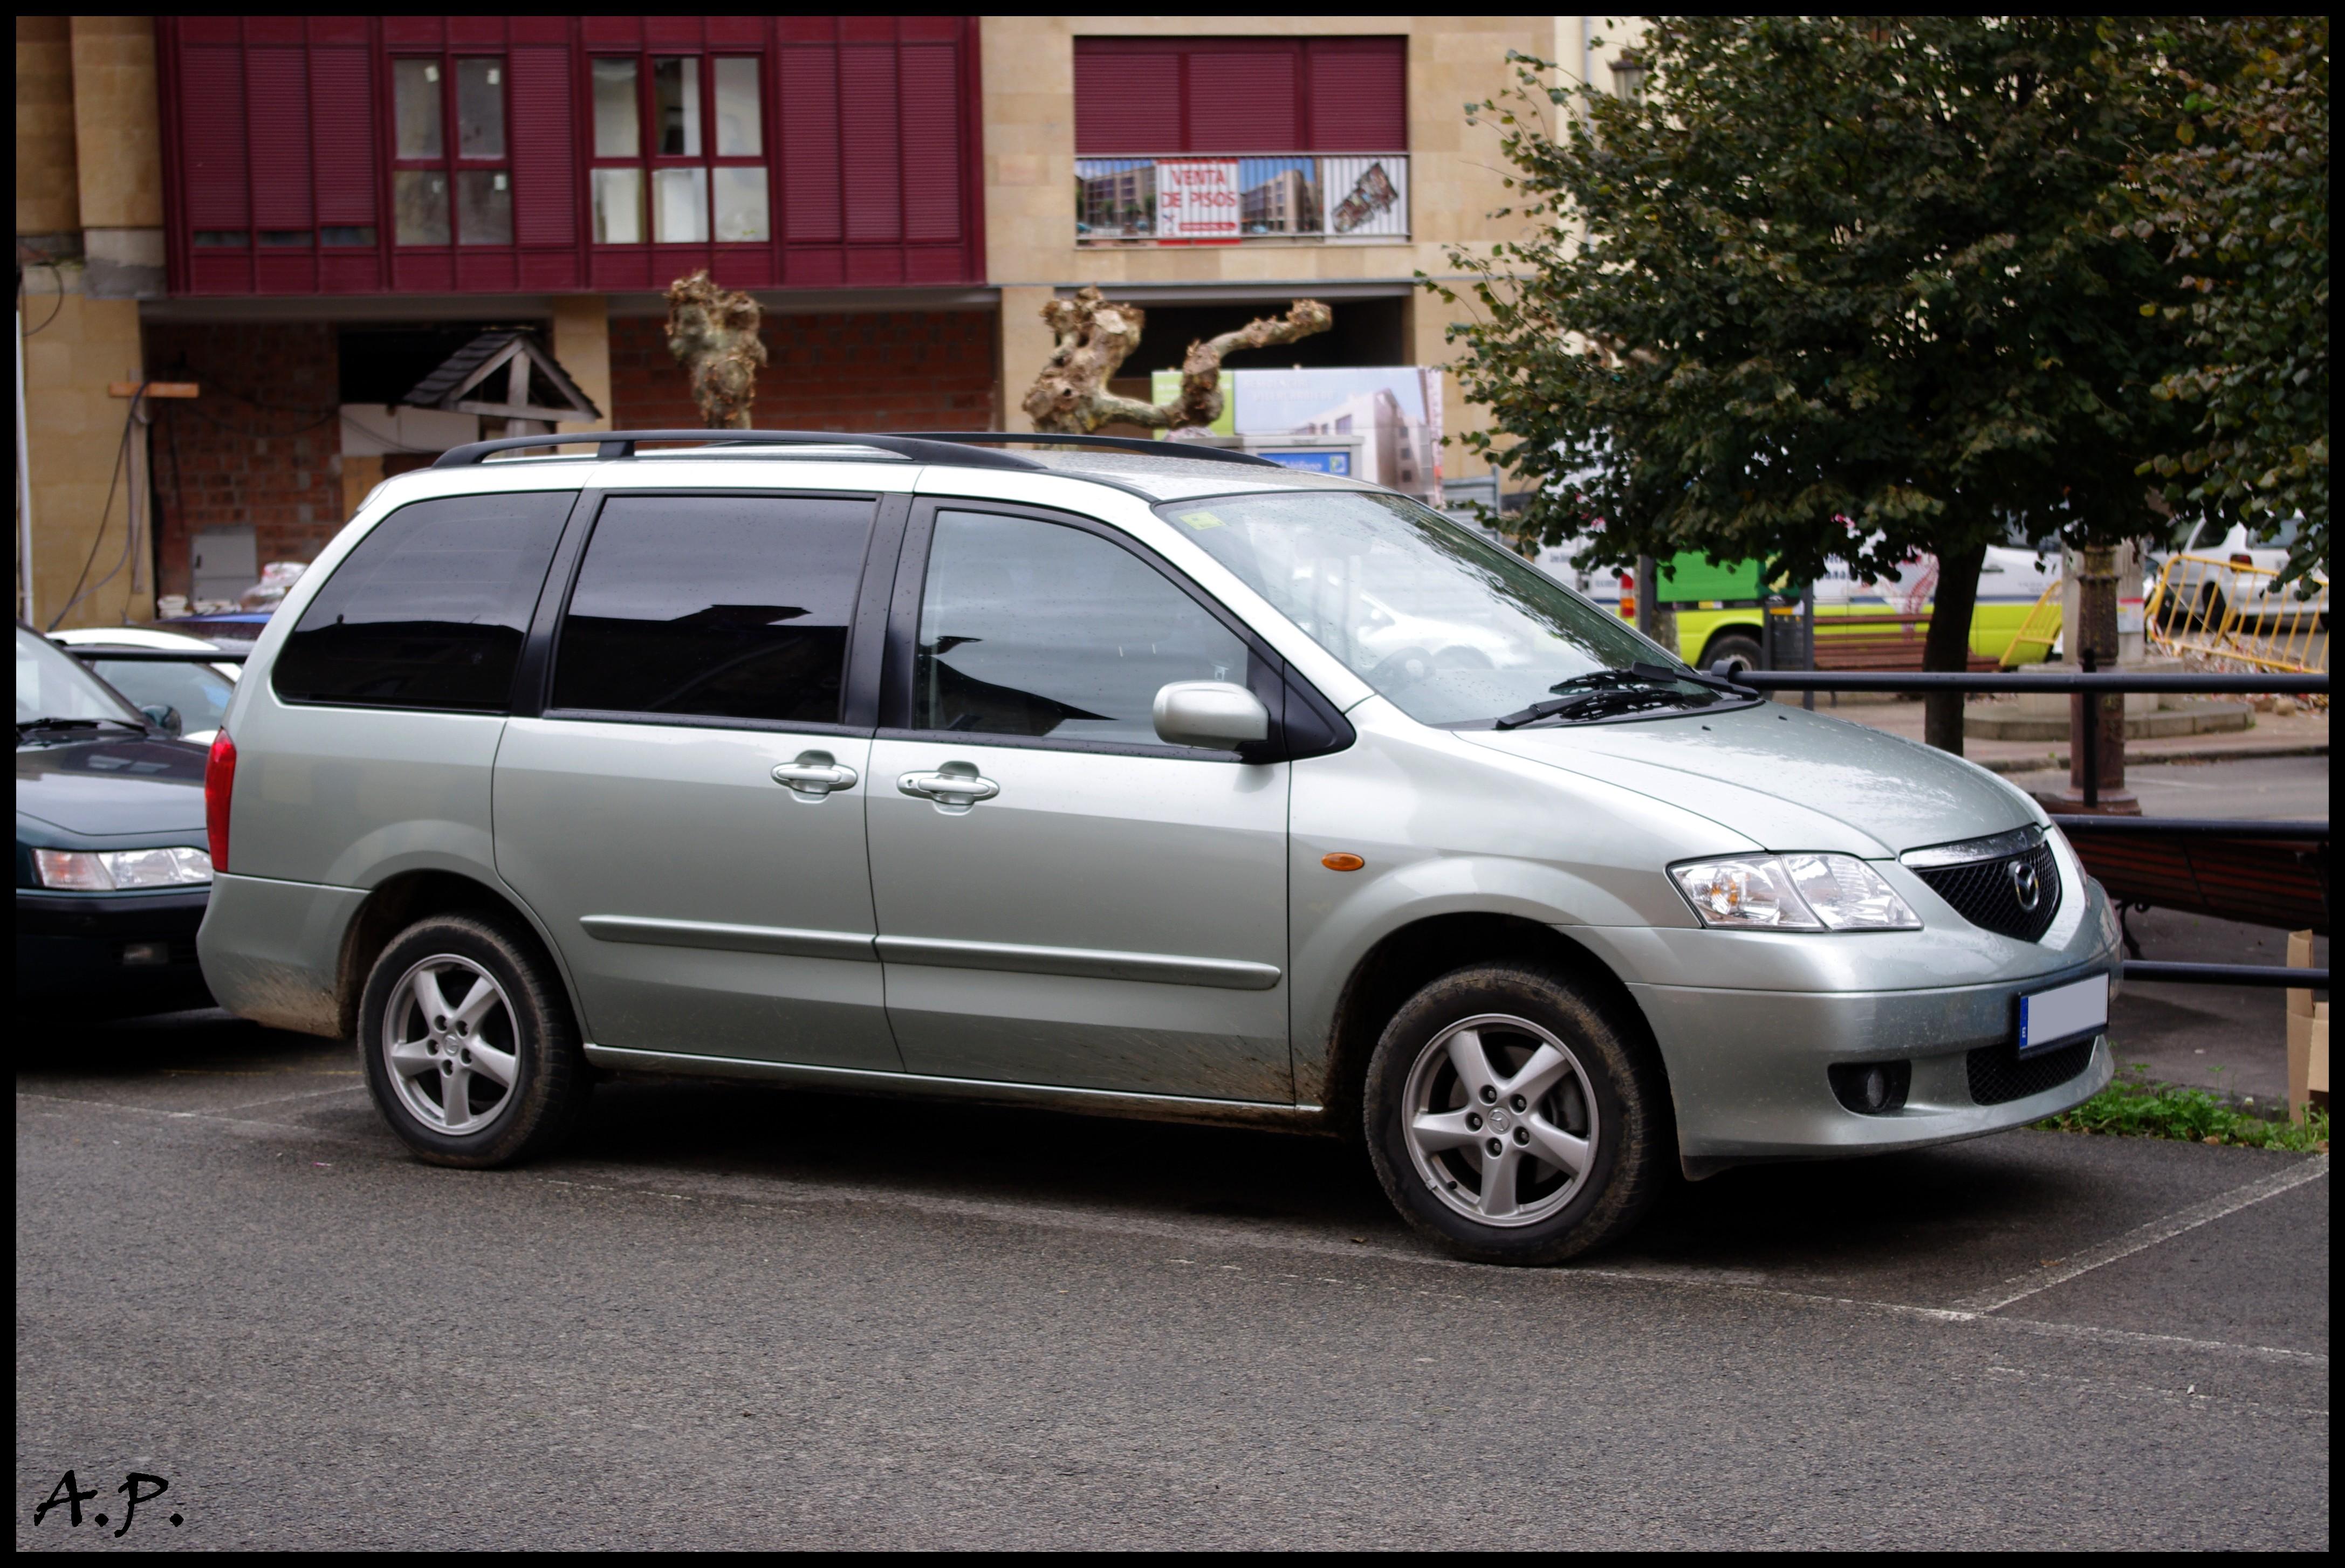 File:2002 Mazda MPV (5164912366) jpg - Wikimedia Commons